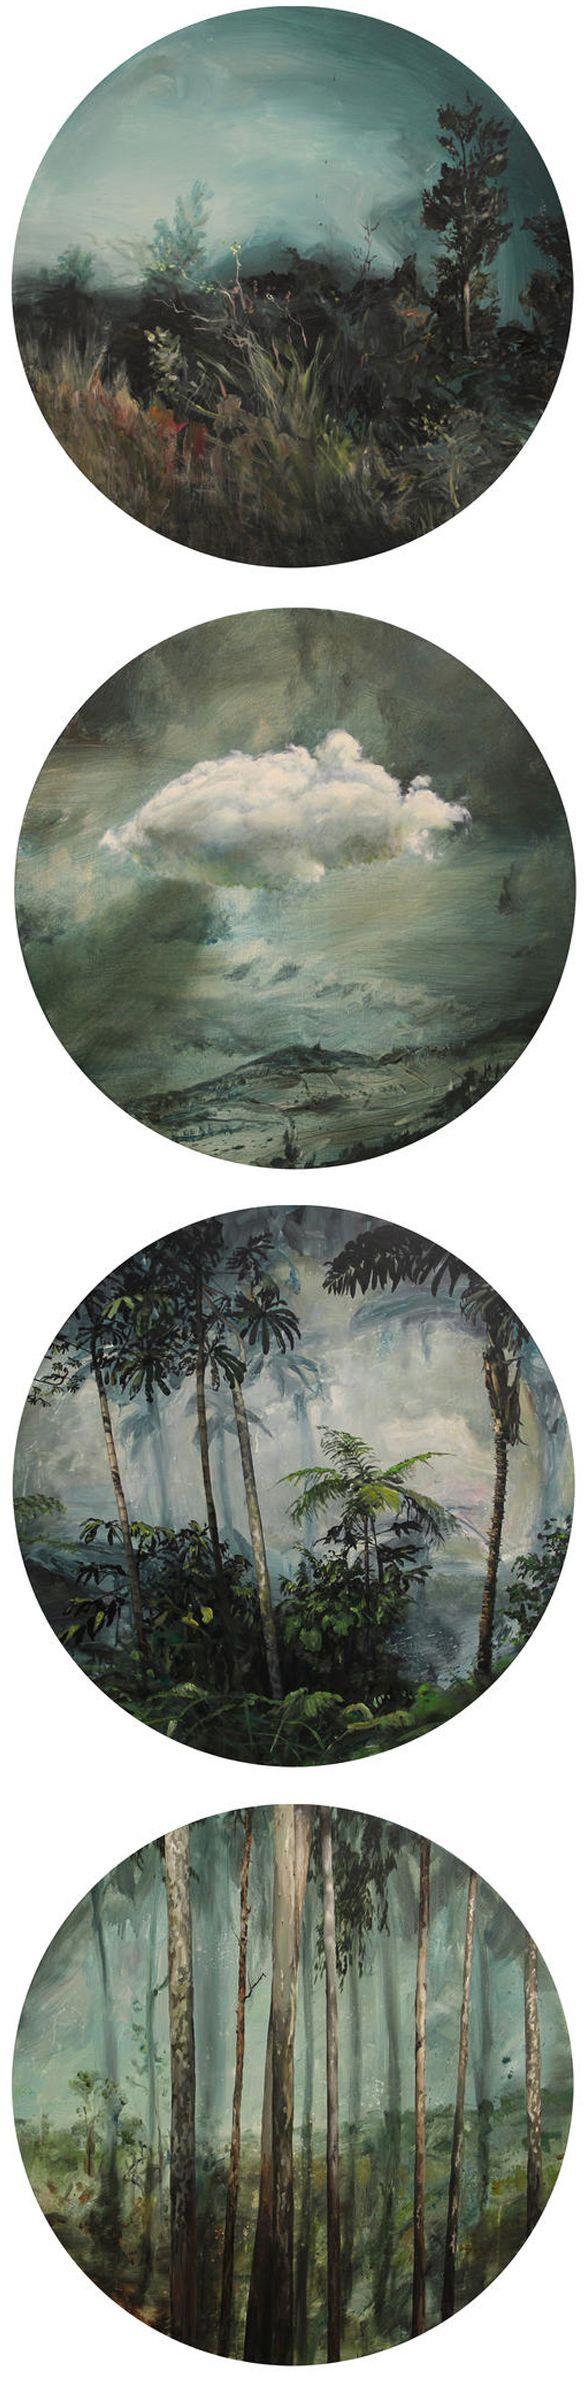 stefan peters - acrylic on circular canvas <3